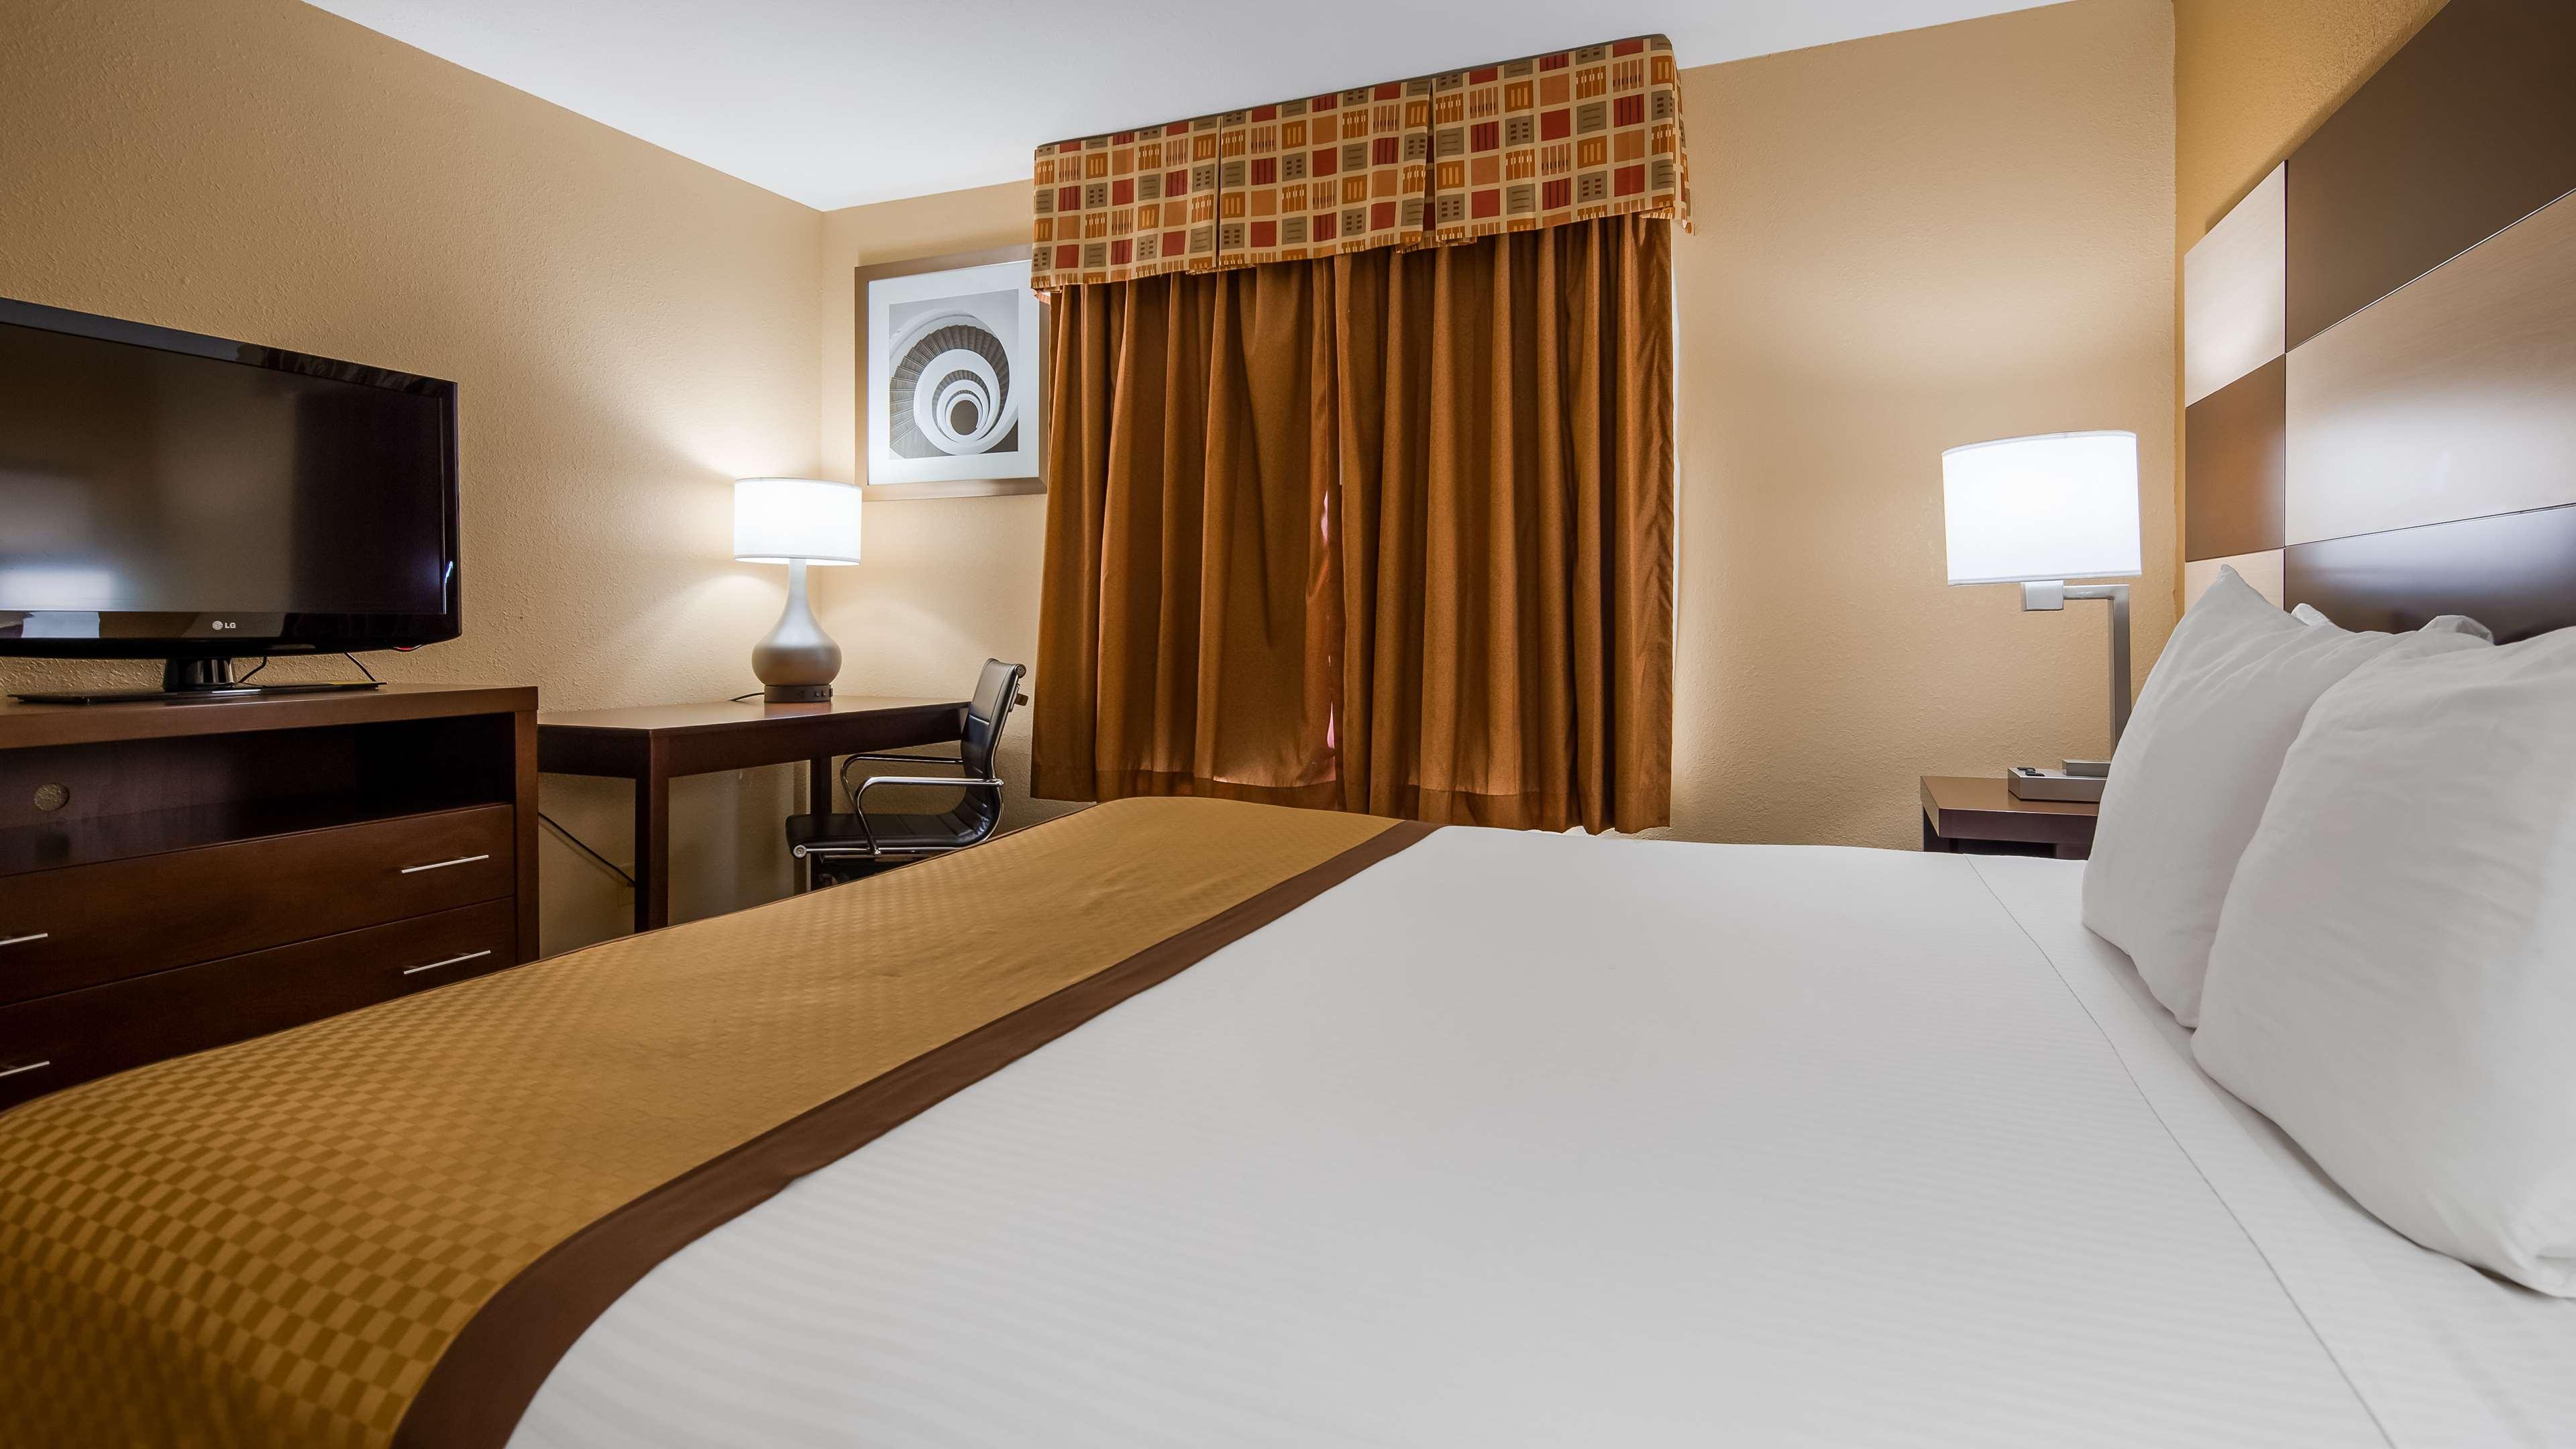 Best Western Joliet Inn & Suites image 11